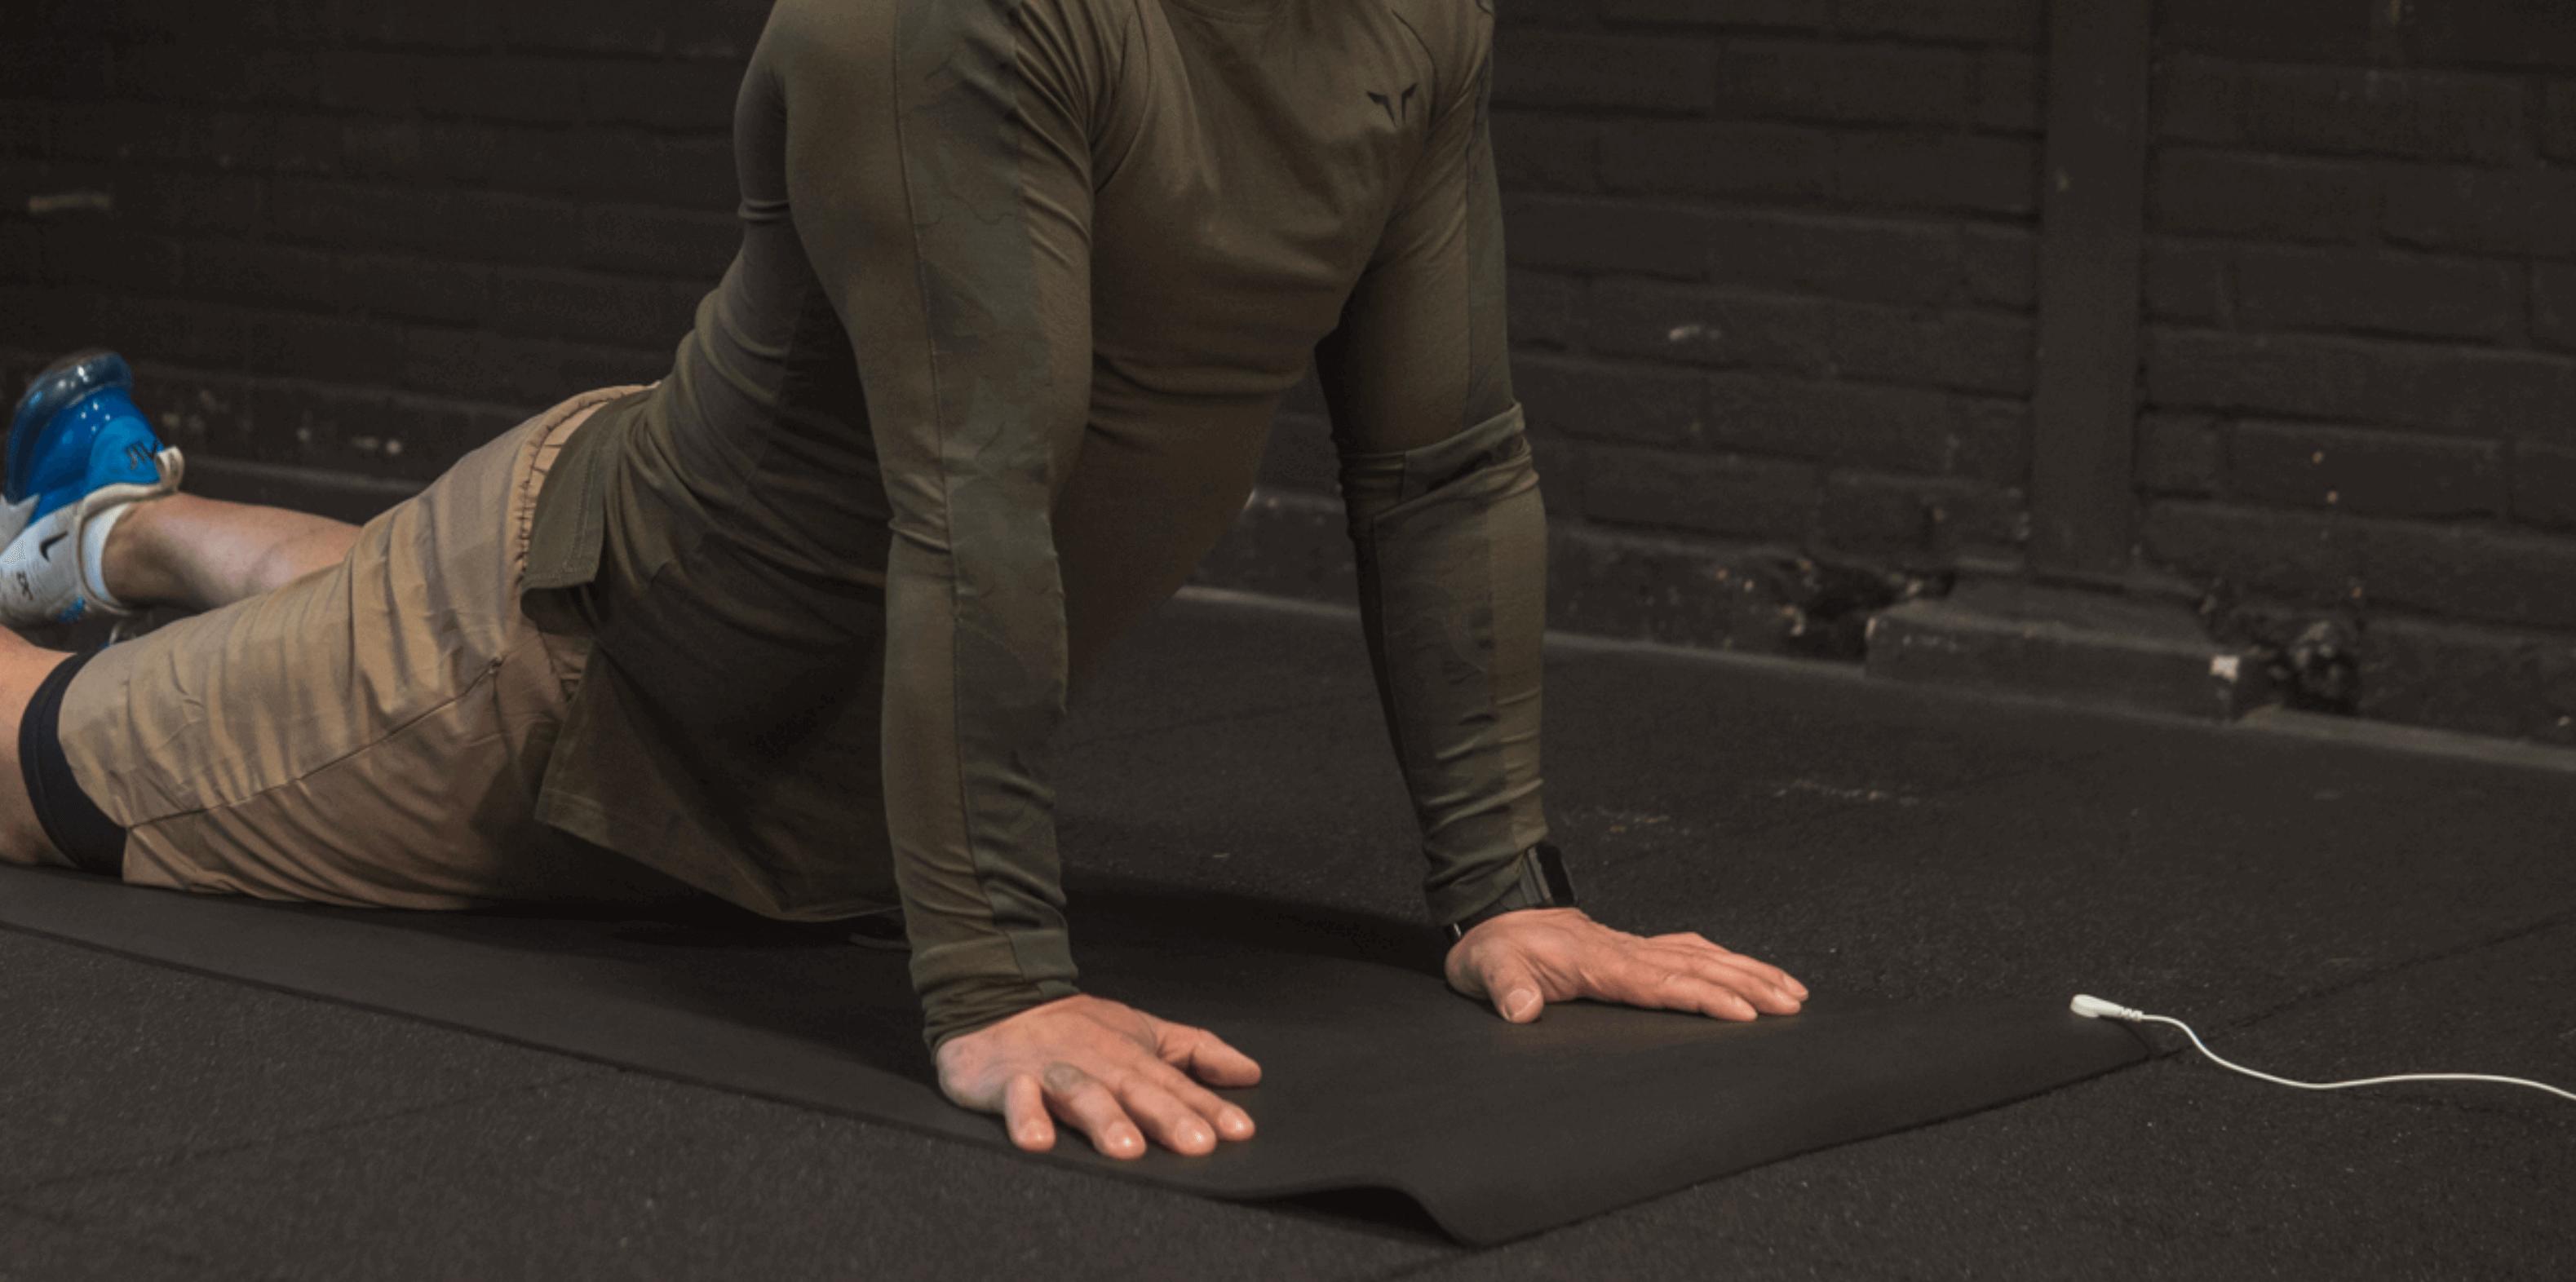 aarden op Aardings yogamat